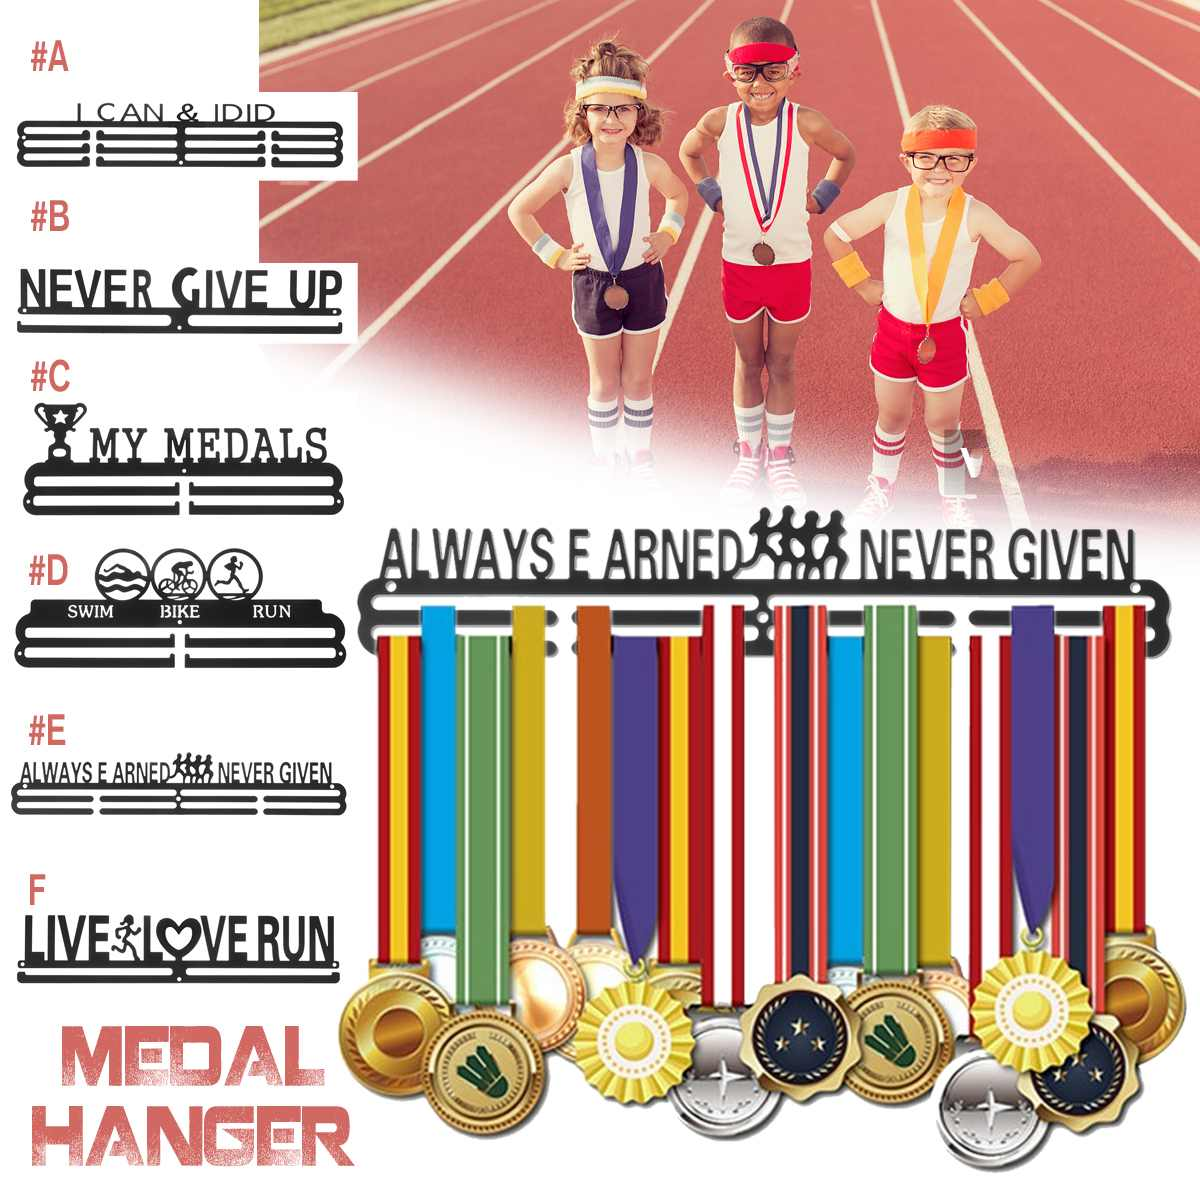 KIWARM 6 Styles Inspirational Medal Hanger Metal Sport Display Rack Medals Holder for 30-45 Medals Wall Home Decor